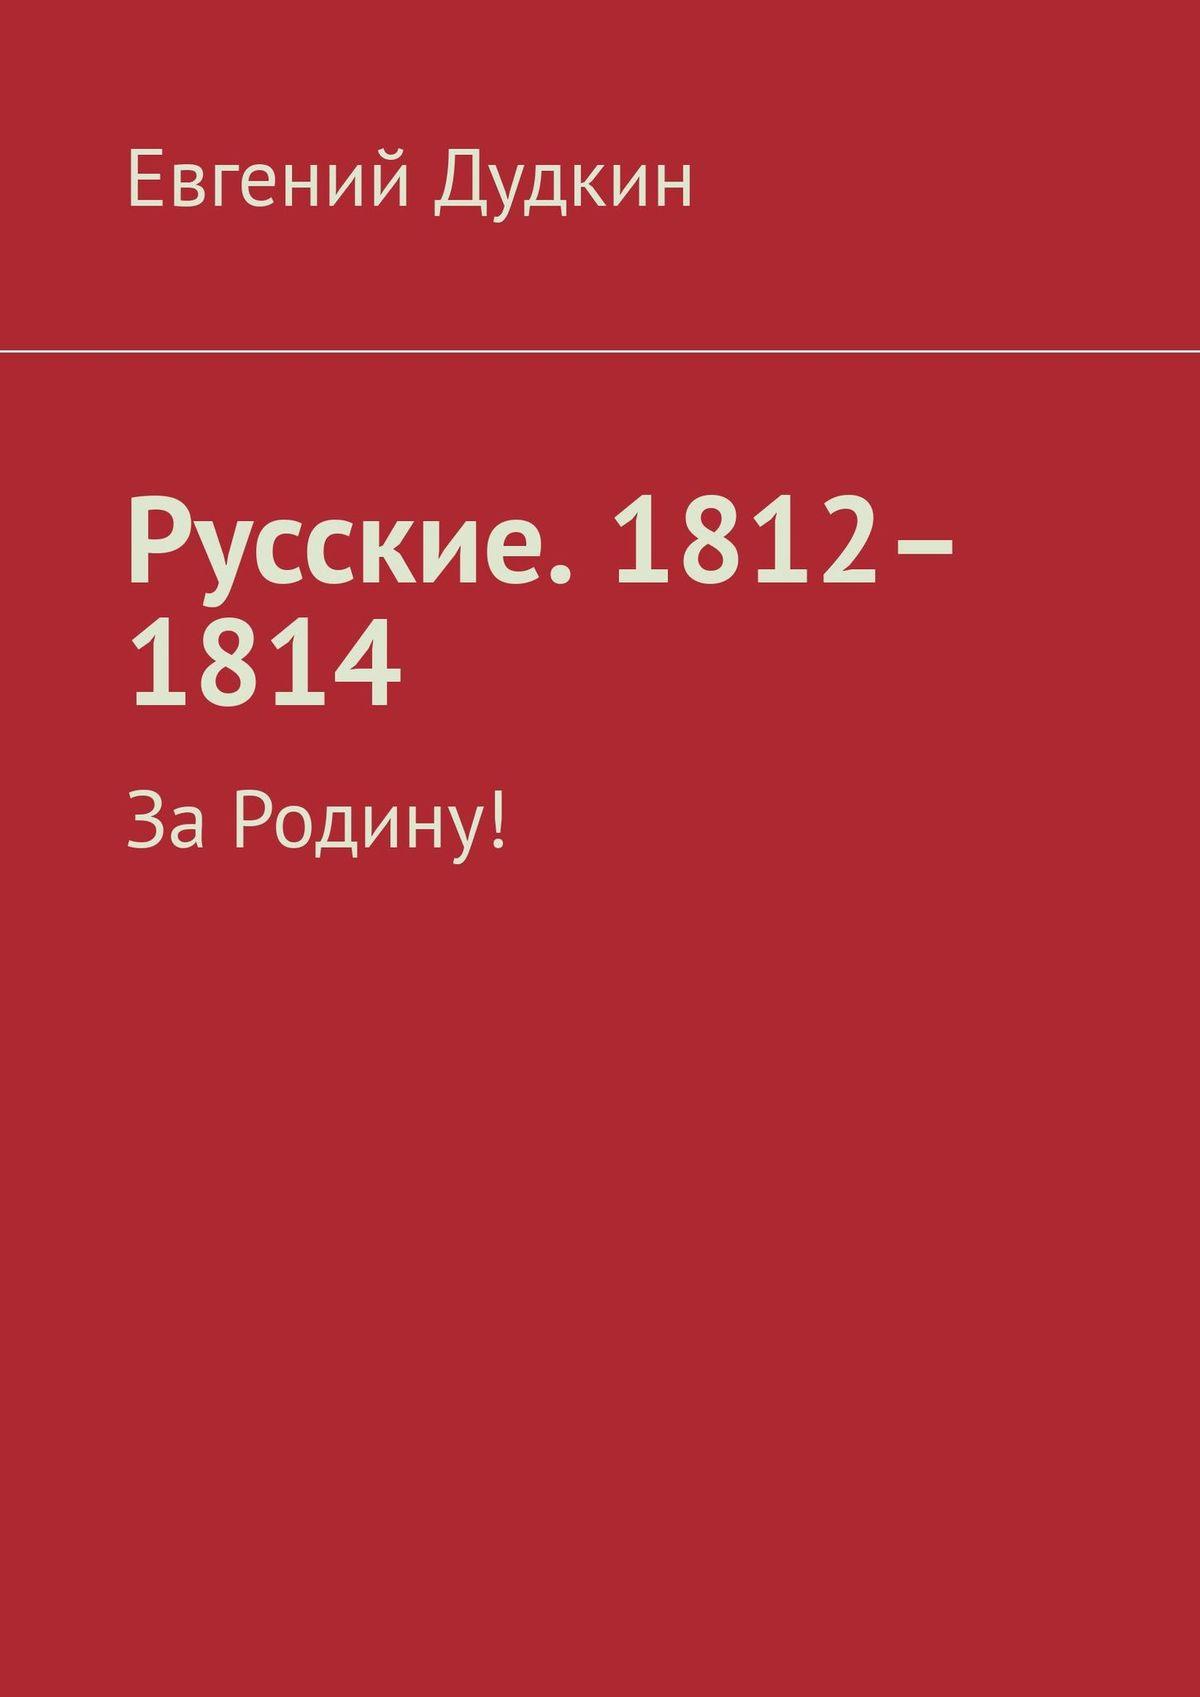 Евгений Дудкин Русские. 1812–1814. За Родину! maxwell mw 1650